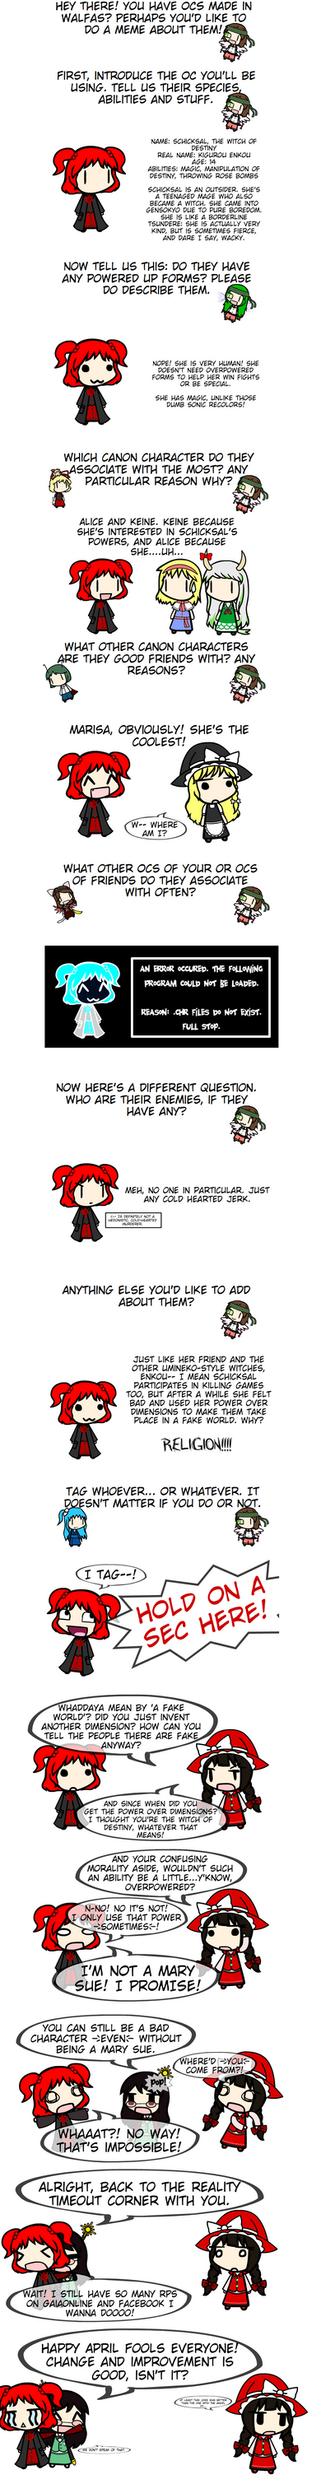 Create.swf OC Meme SUPER REDUX~! (April Fools) by Kigurou-Enkou